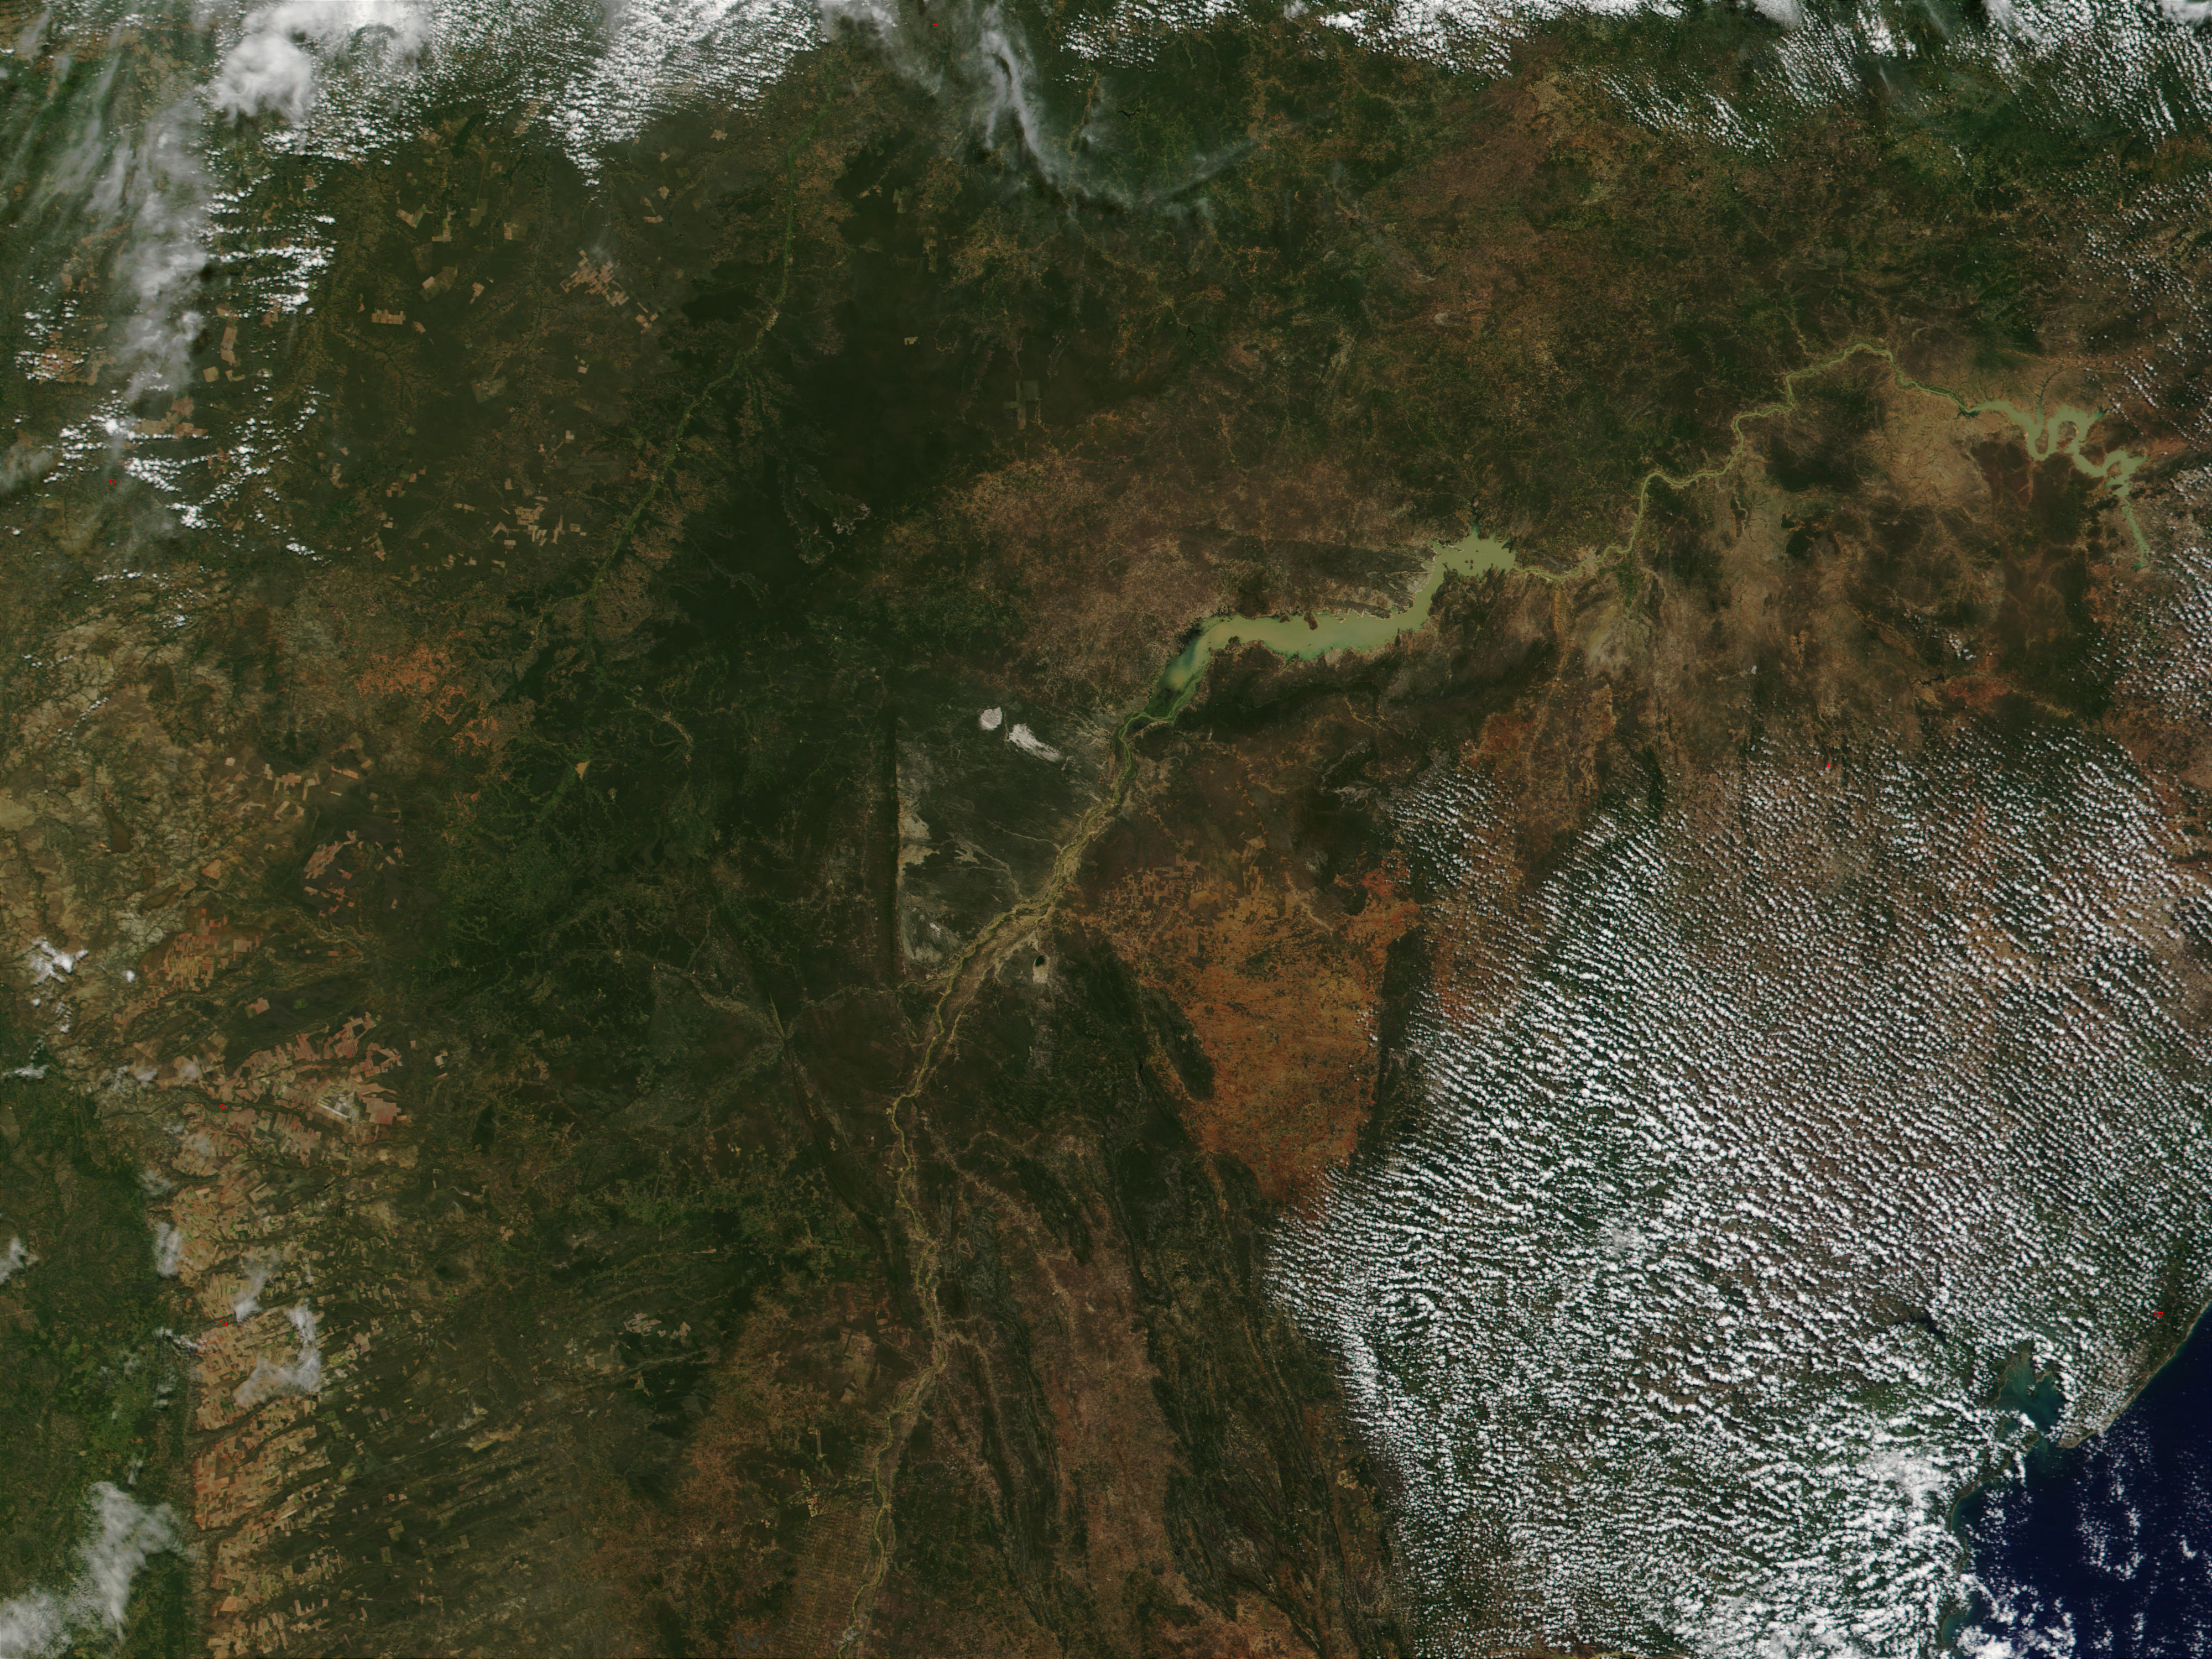 São Francisco River and Sobradinho Reservoir, Brazil